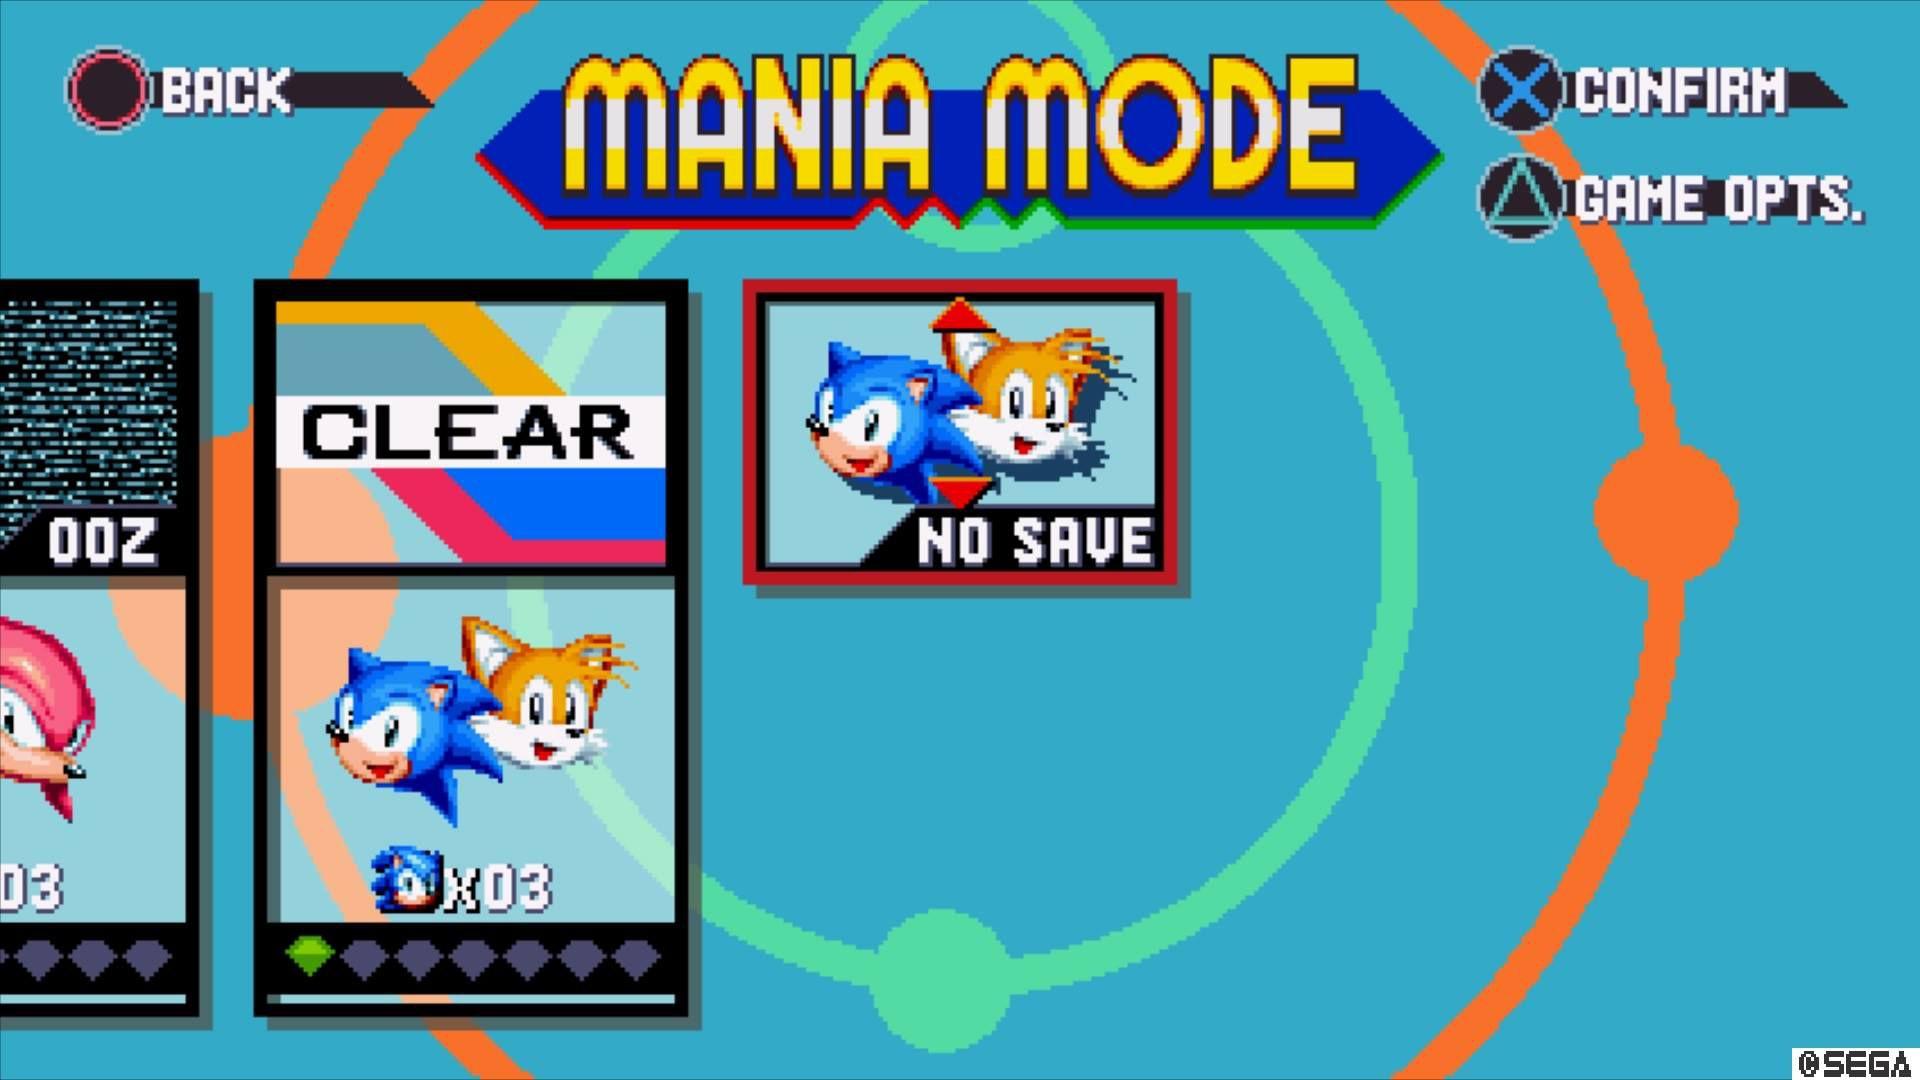 From the Mania mode menu, highlight No Save.